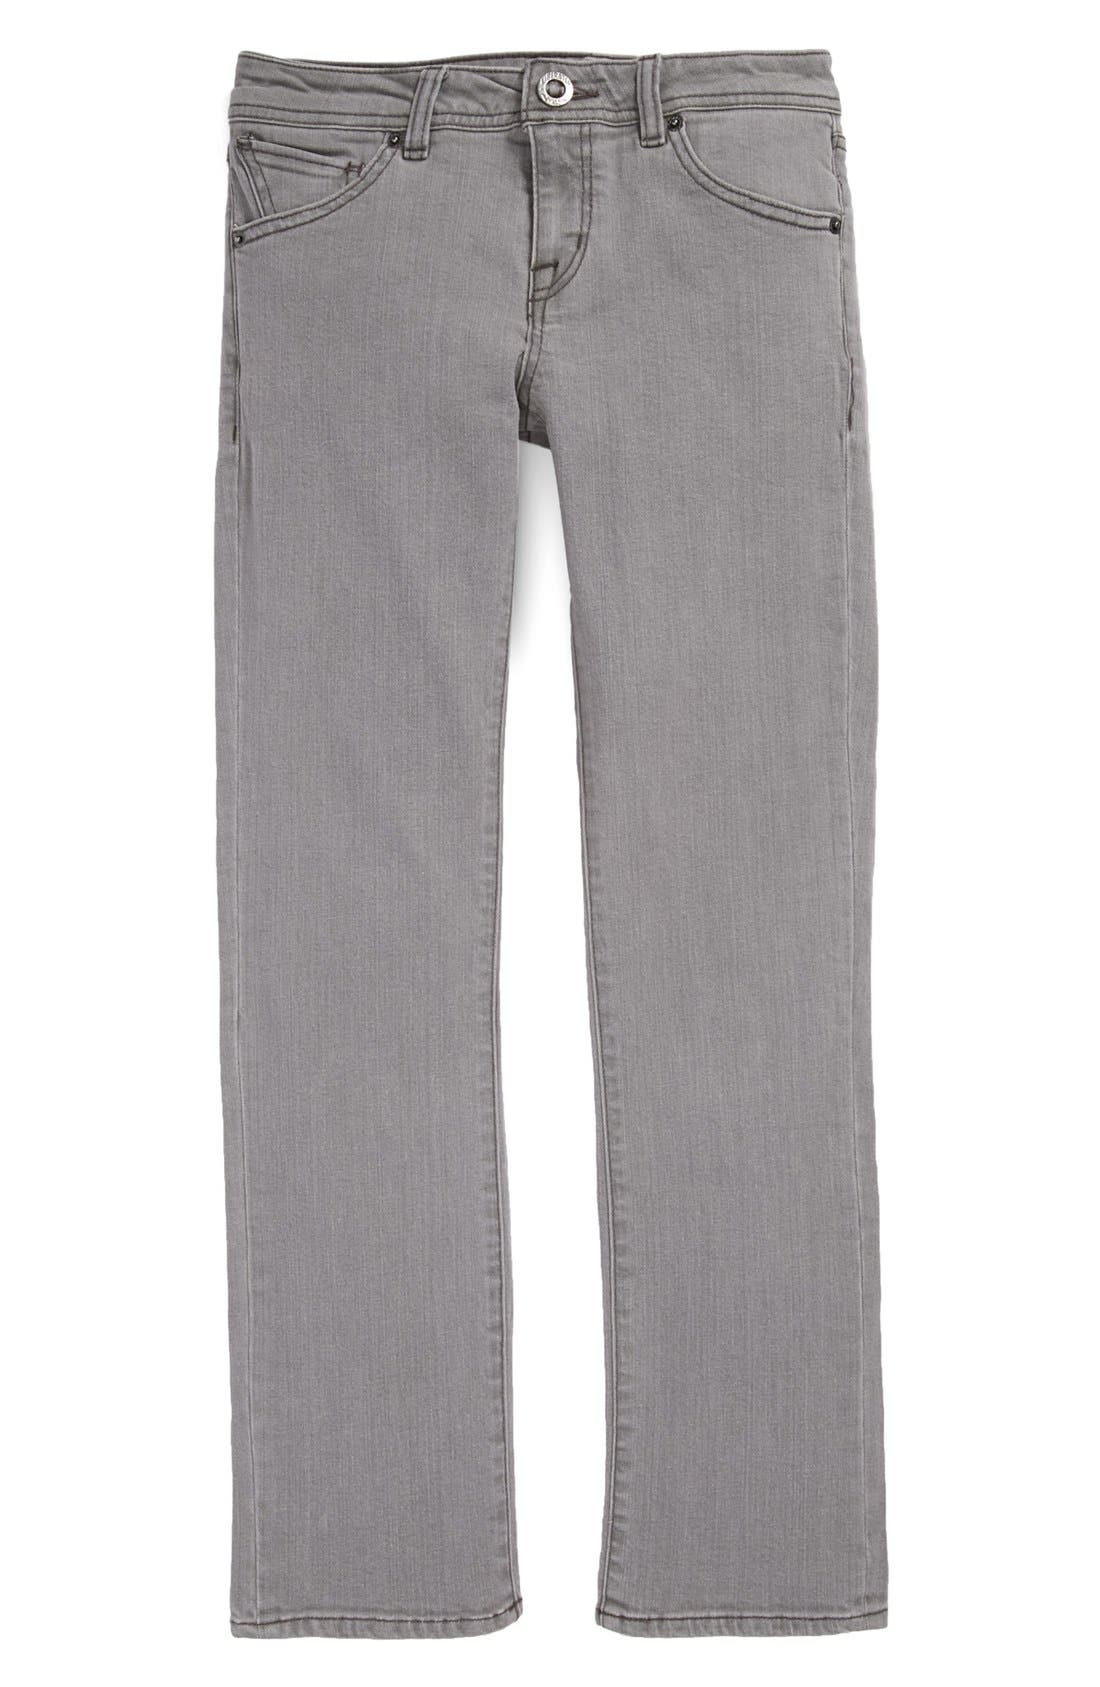 Alternate Image 2  - Volcom 'Vorta' Jeans (Big Boys)